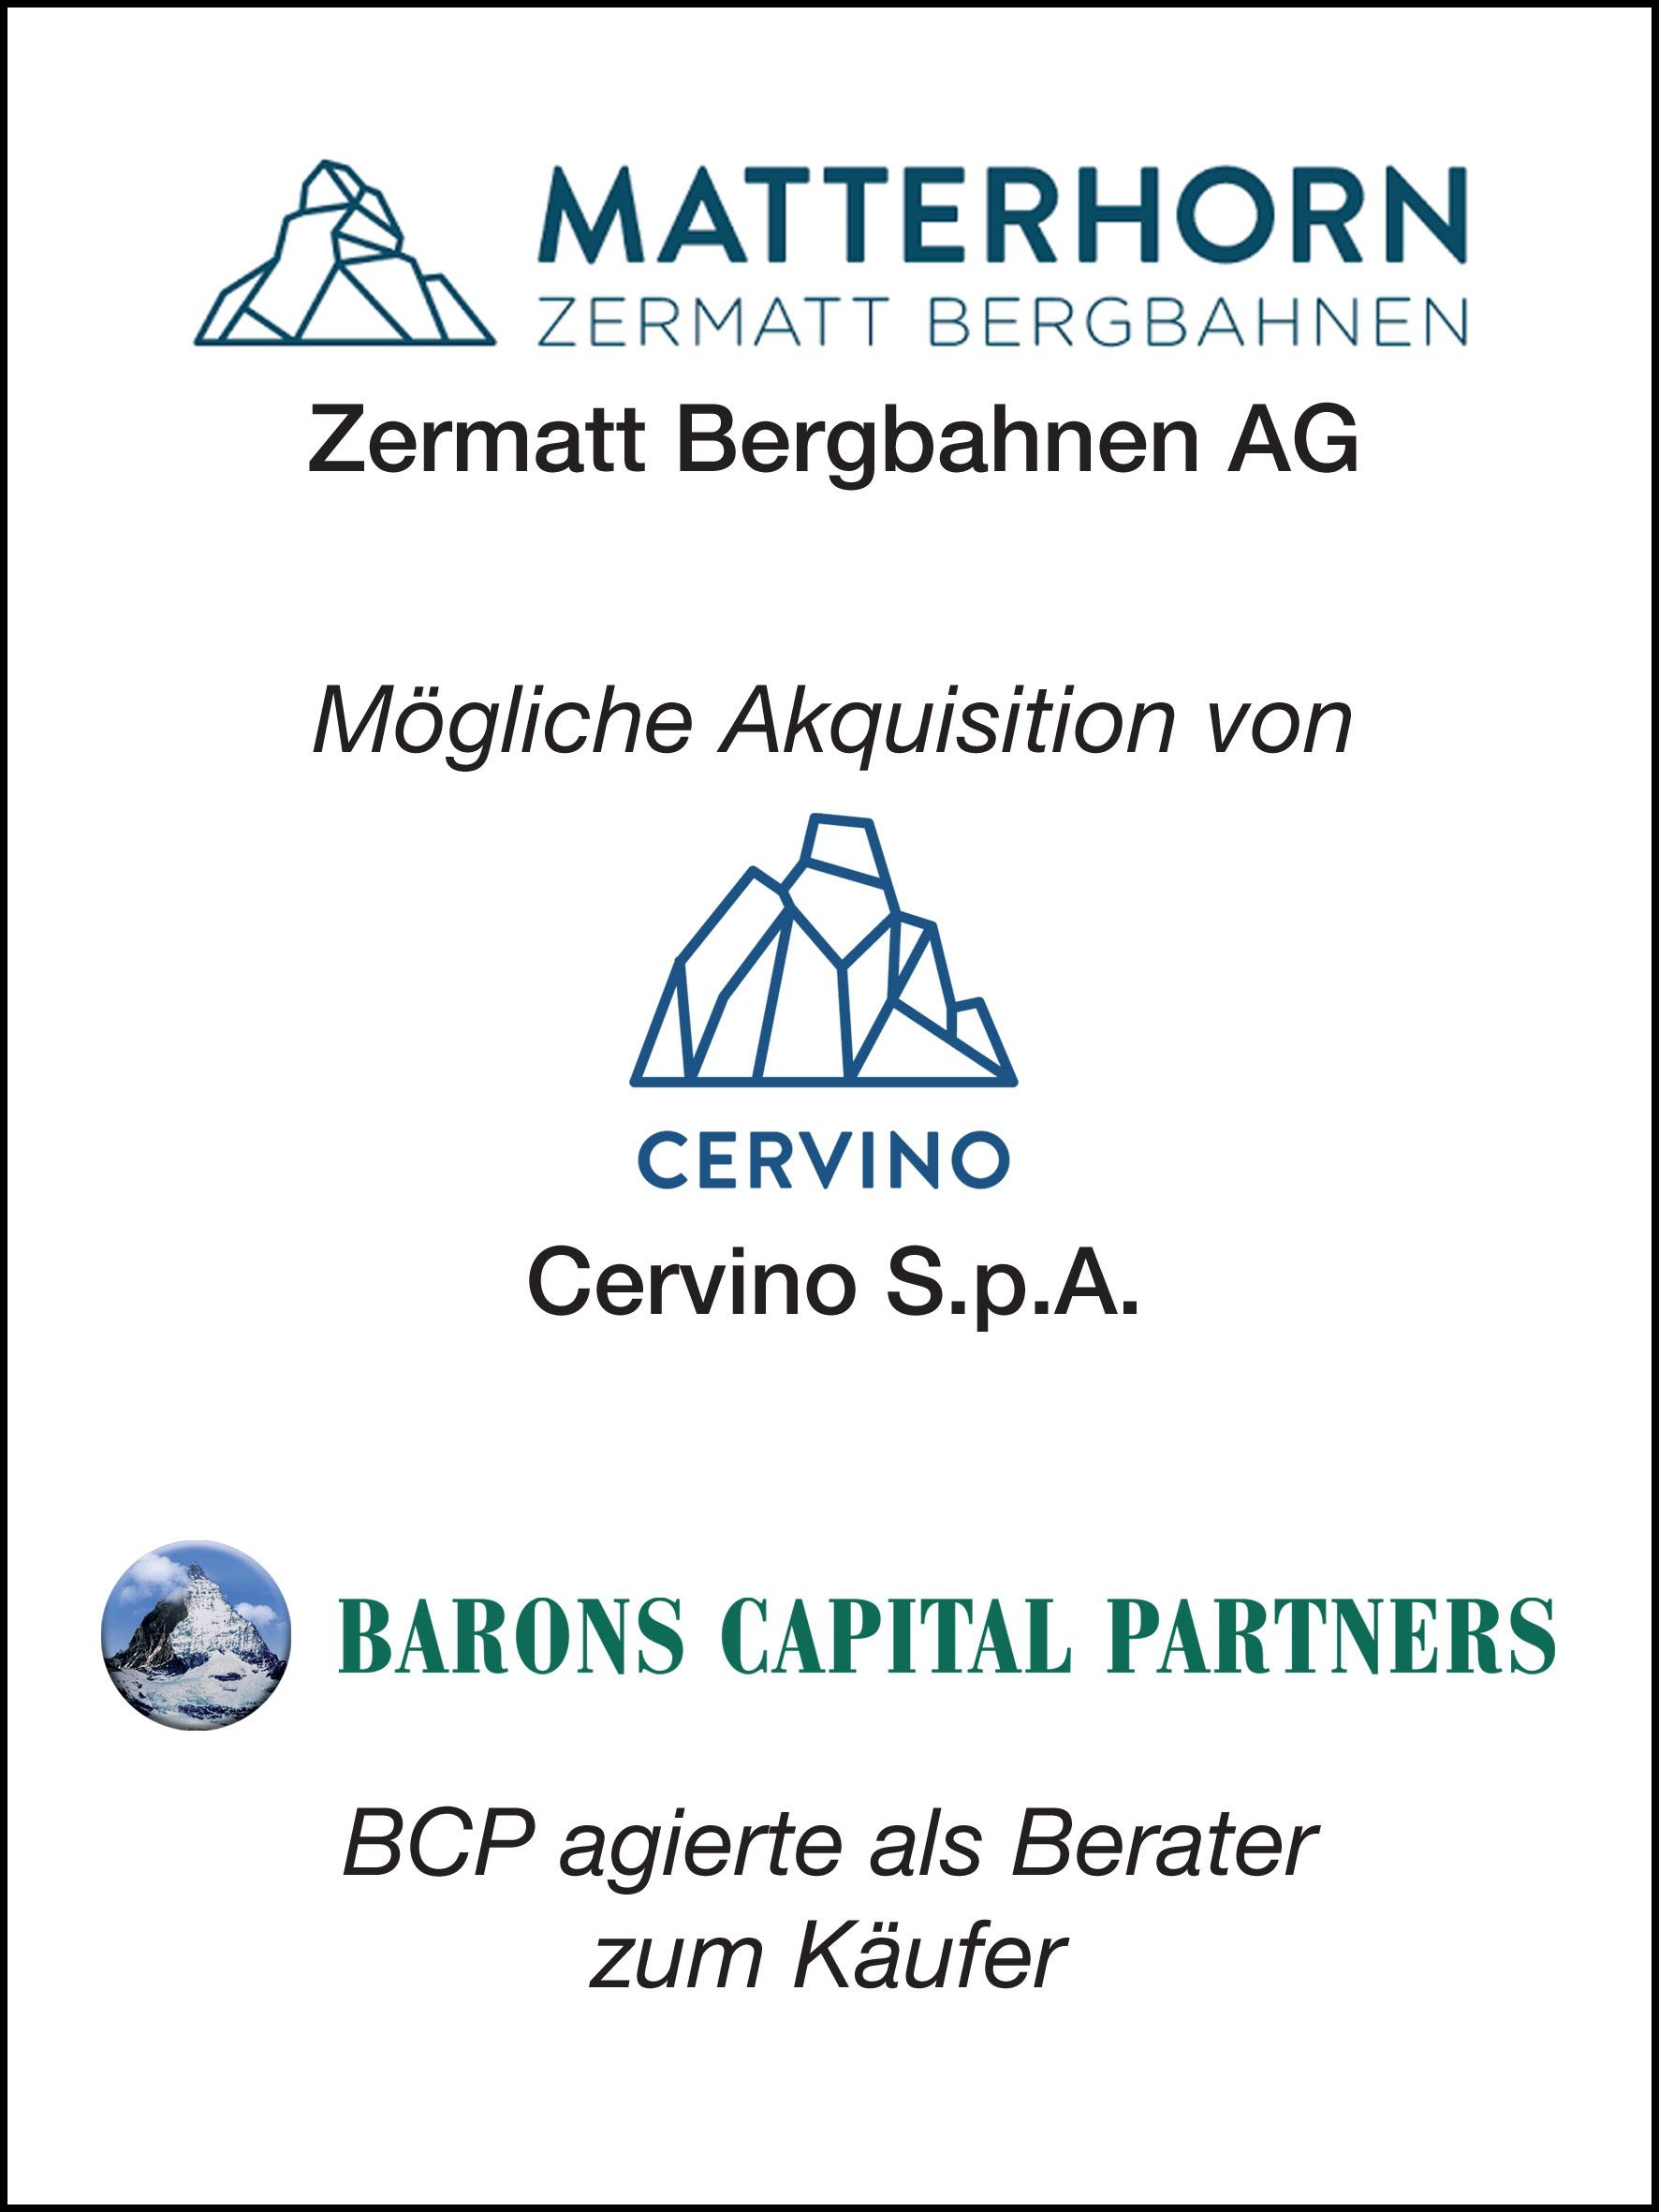 15_Zermatt Bergbahnen AG_G